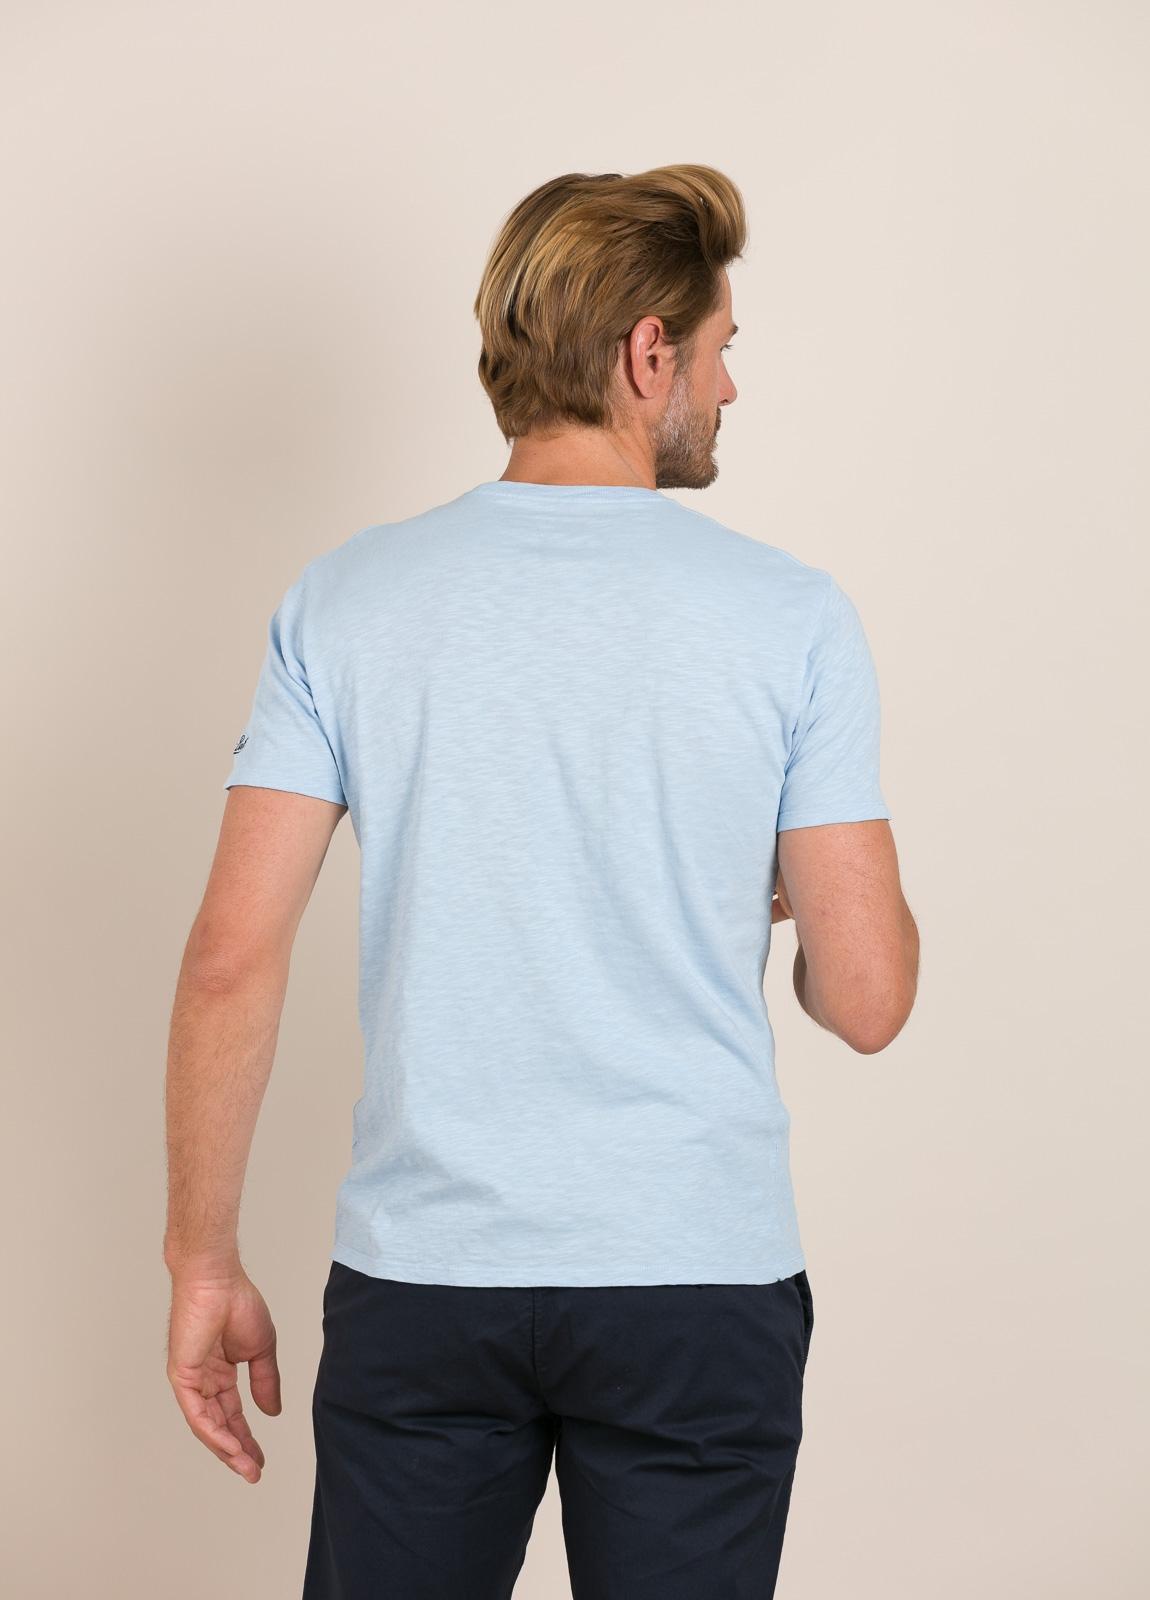 Camiseta MC2 piña colada celeste - Ítem1